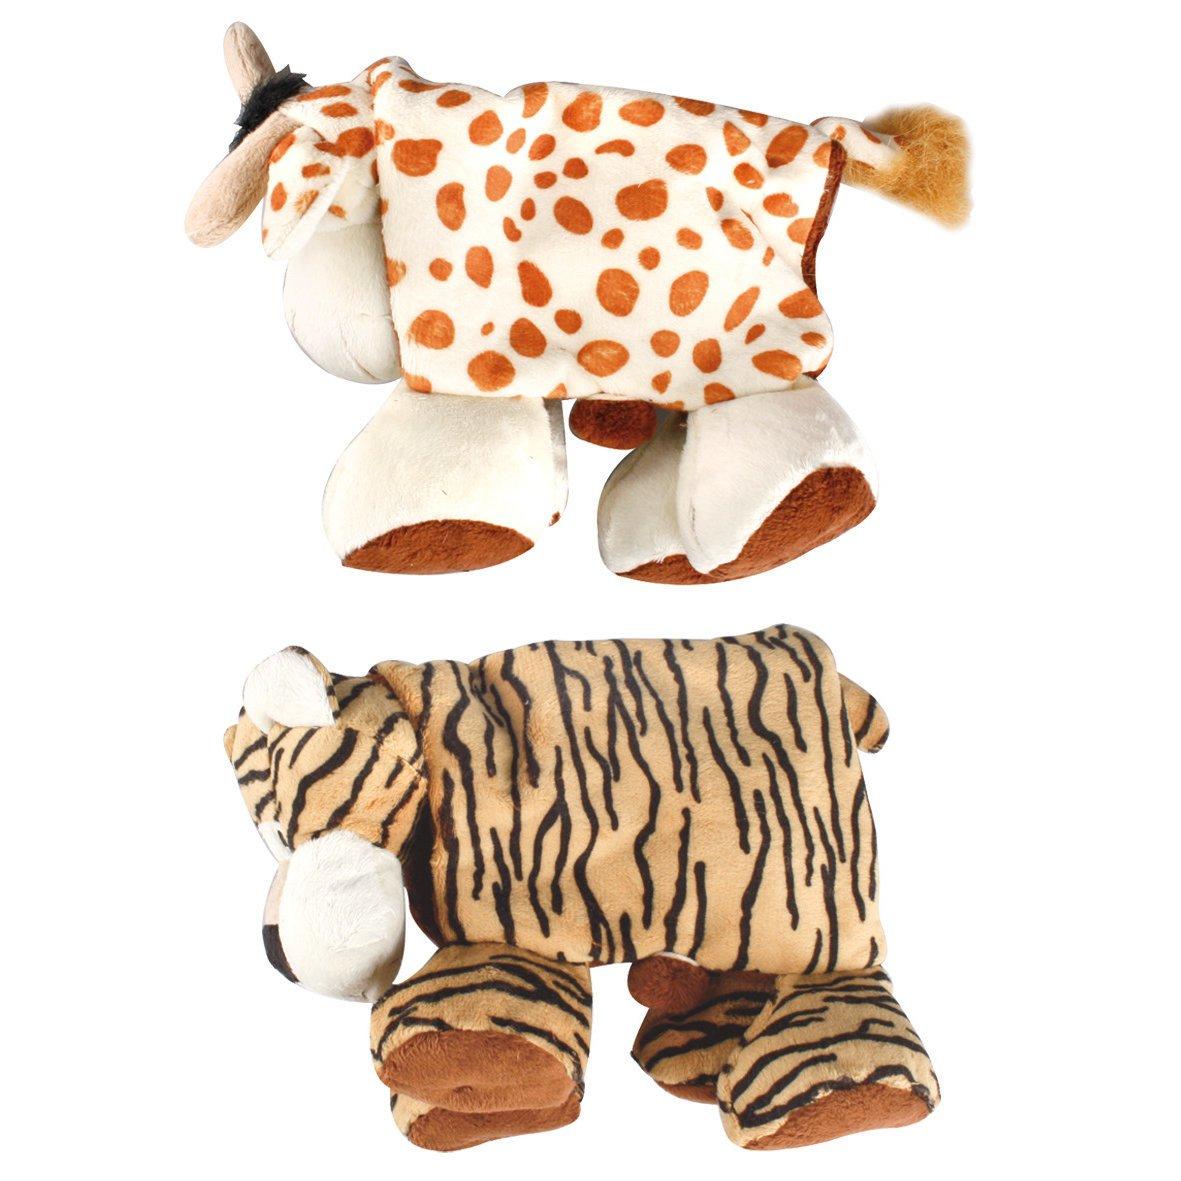 Karlie Plüschtier für Hunde Safari Animals faltbar, faltbar (L: 38 cm B: 30 cm H: 10 cm)